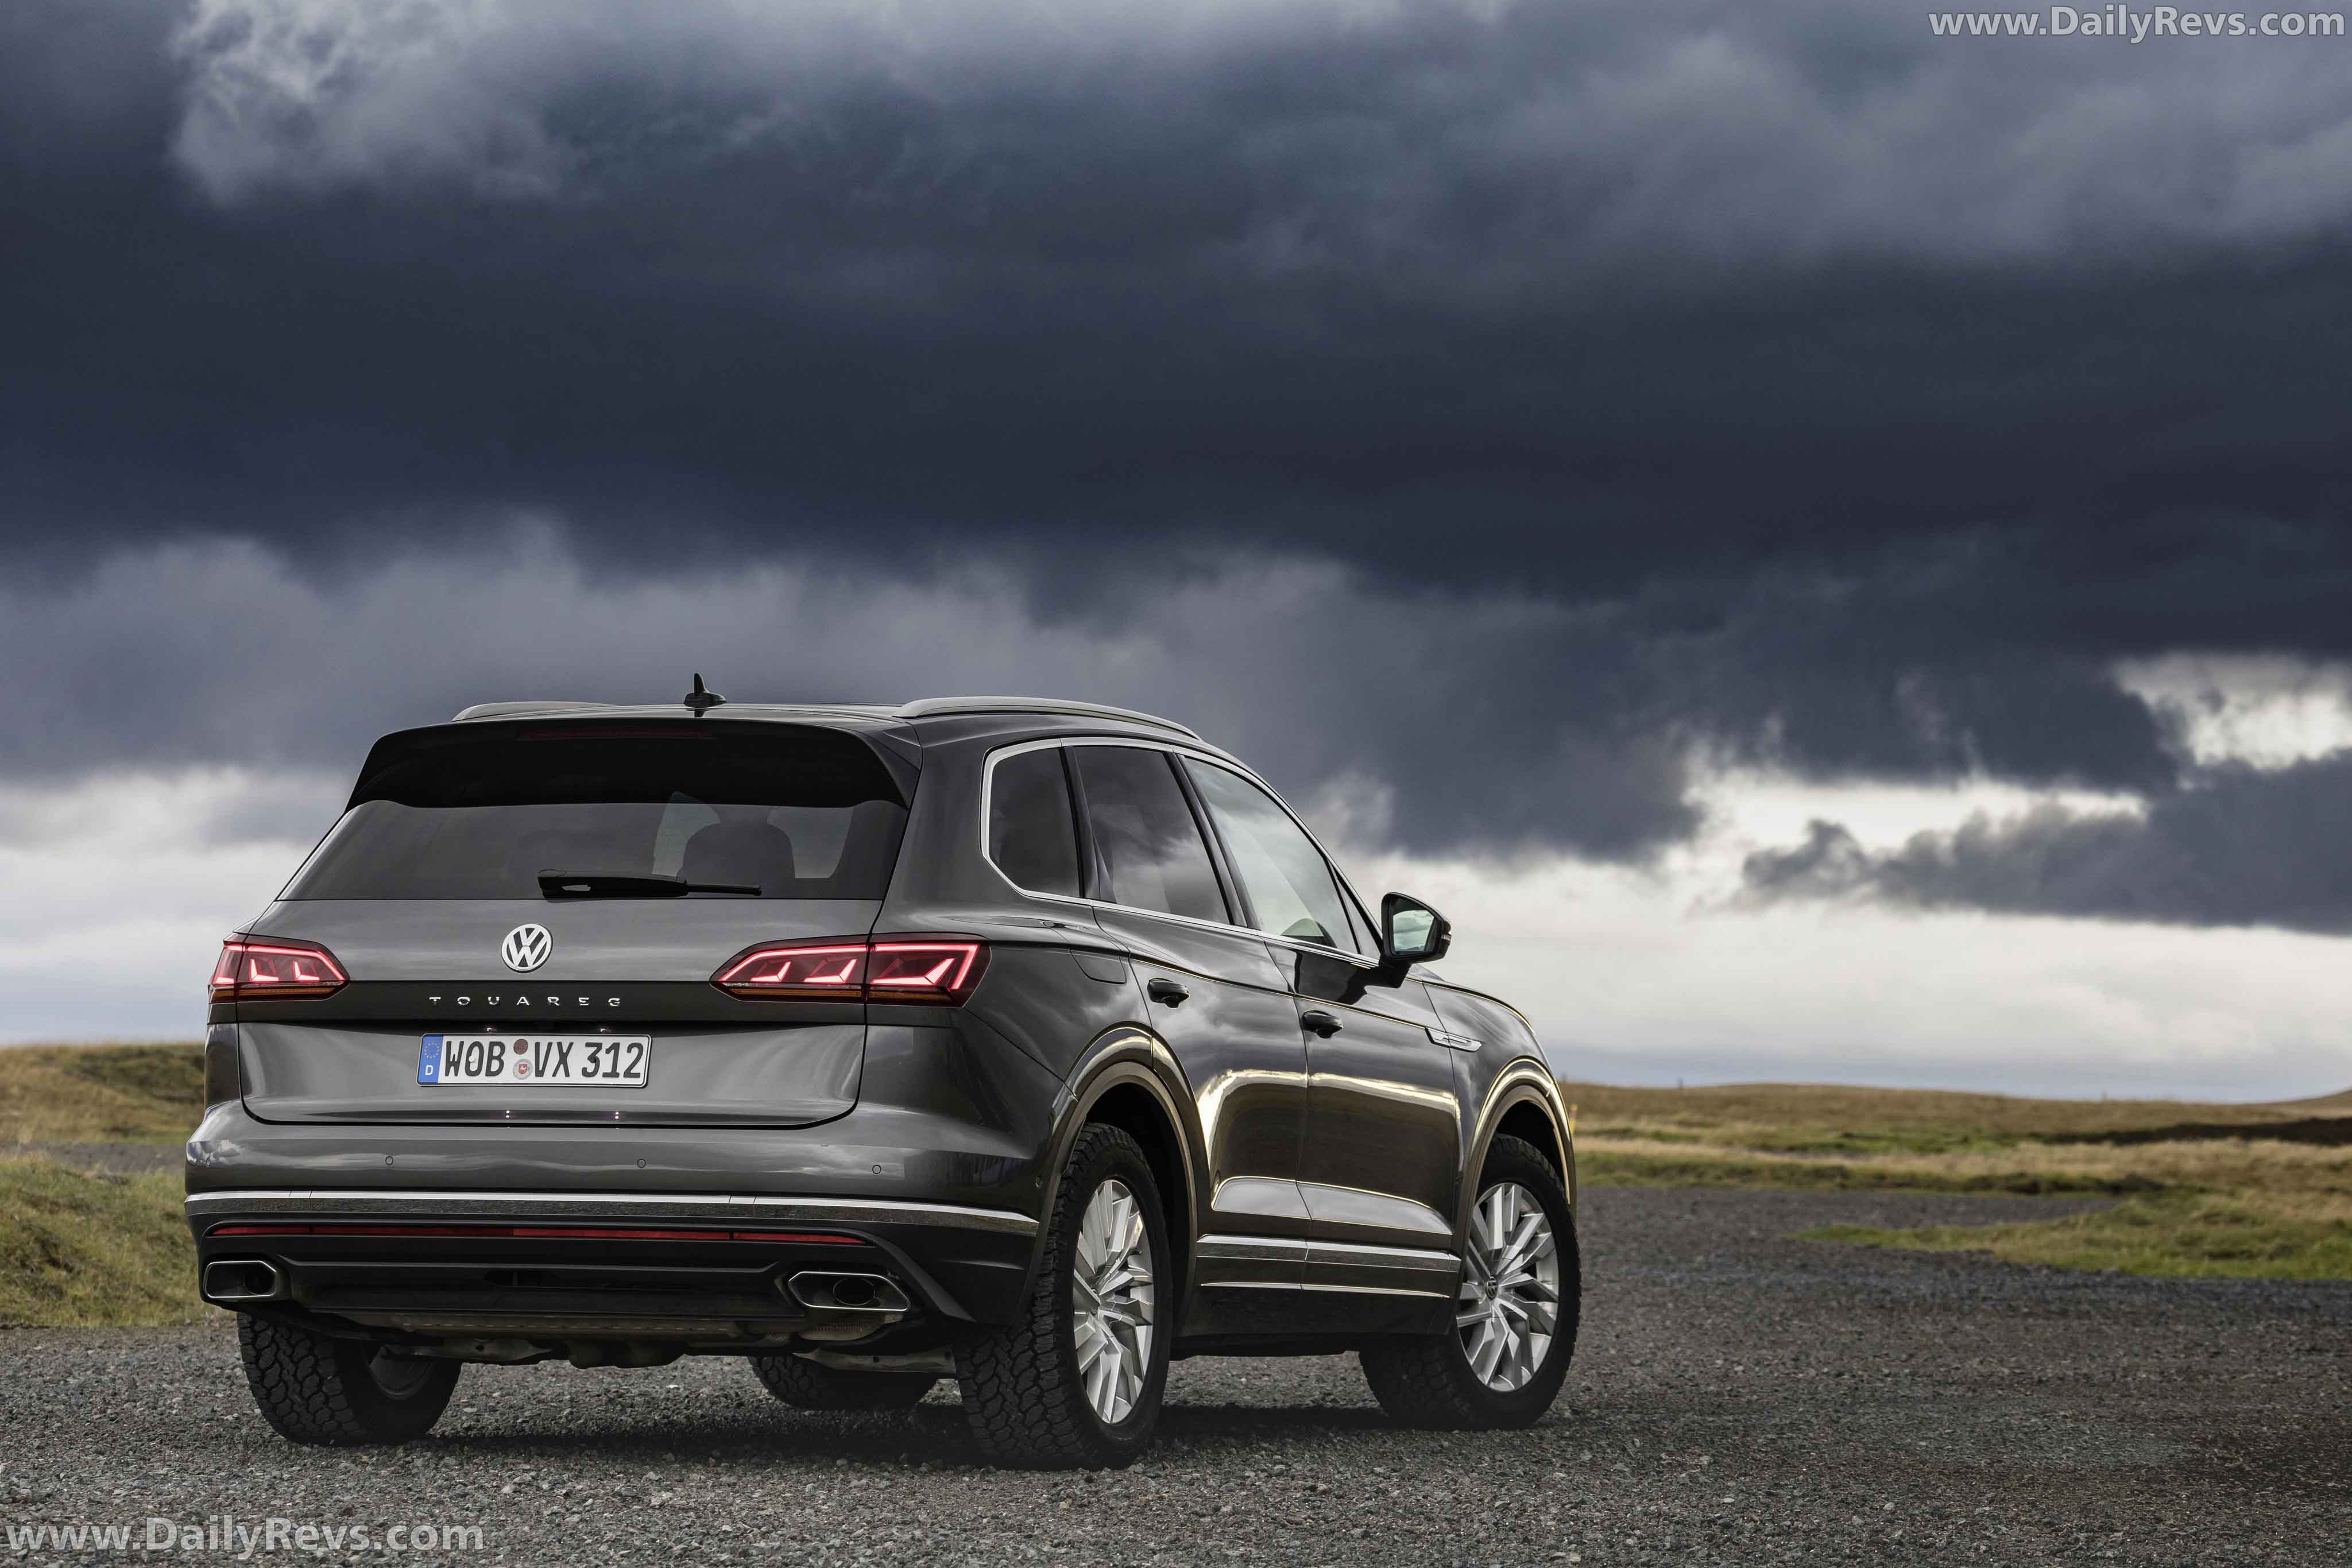 2020 Volkswagen Touareg SE - HD Pictures, Videos, Specs ...